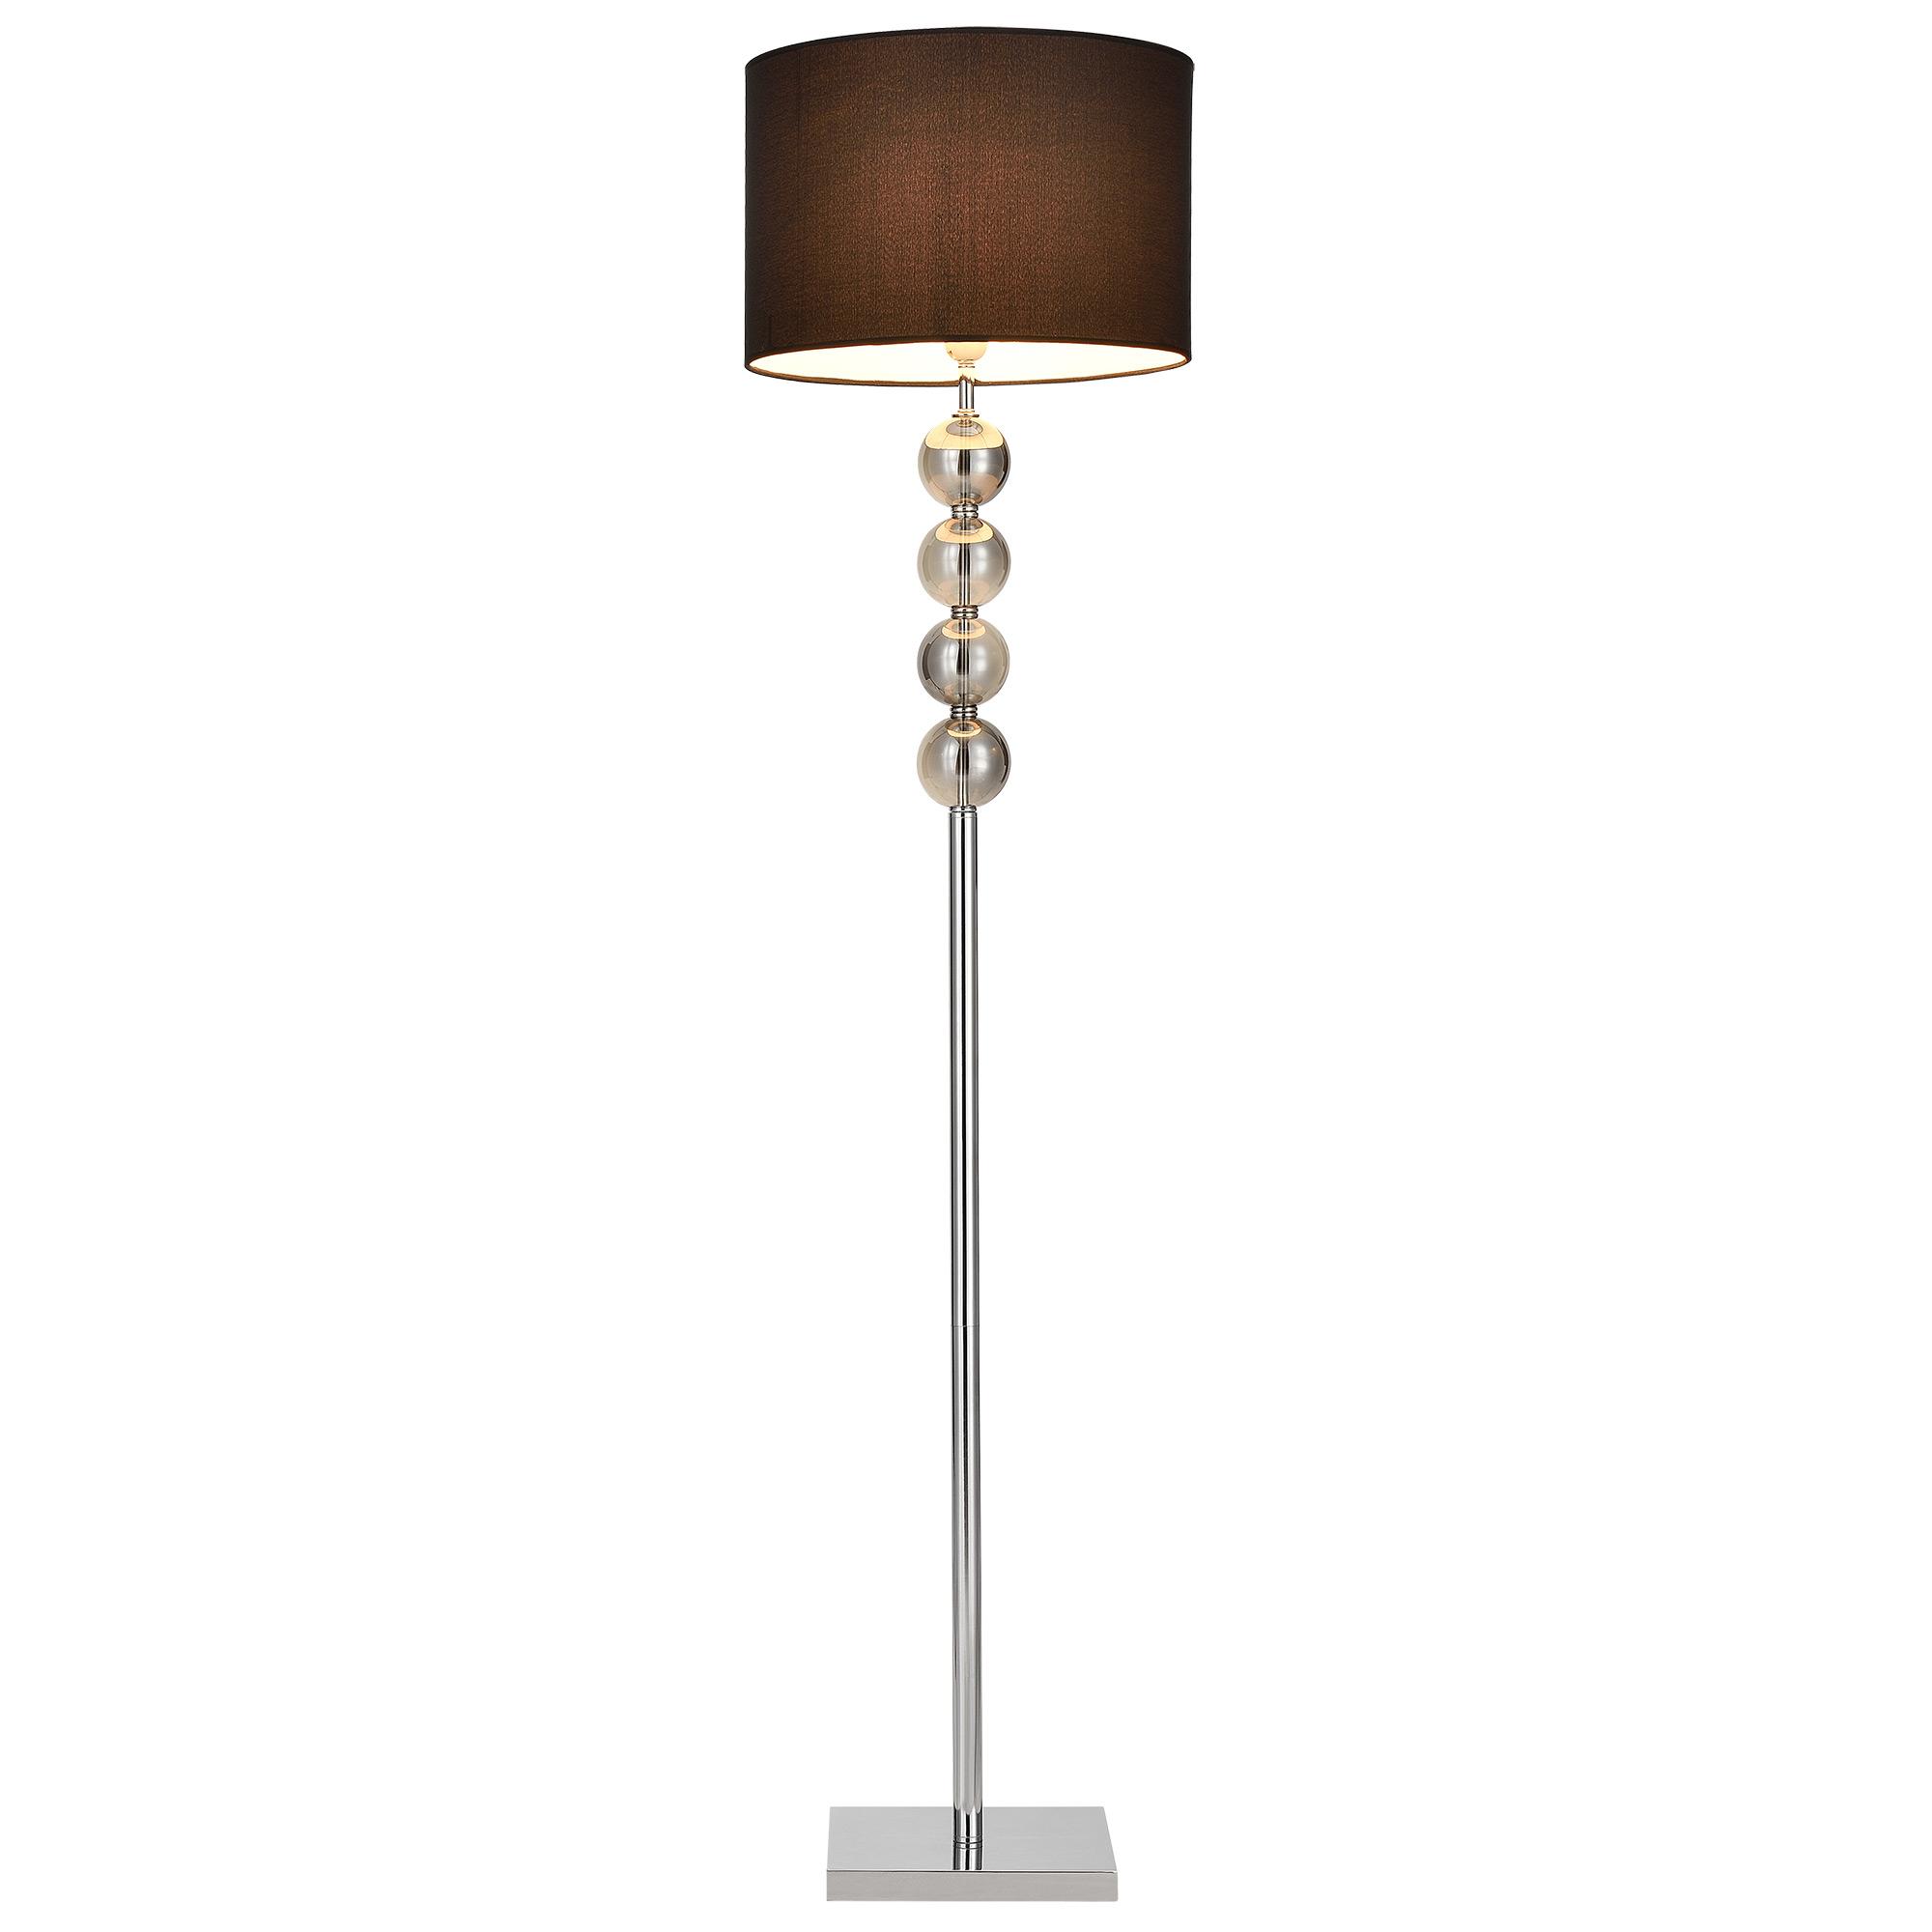 [lux.pro]® Lampa de podea eleganta – Spheridern 1 x E 27 – 60W – crom /negru